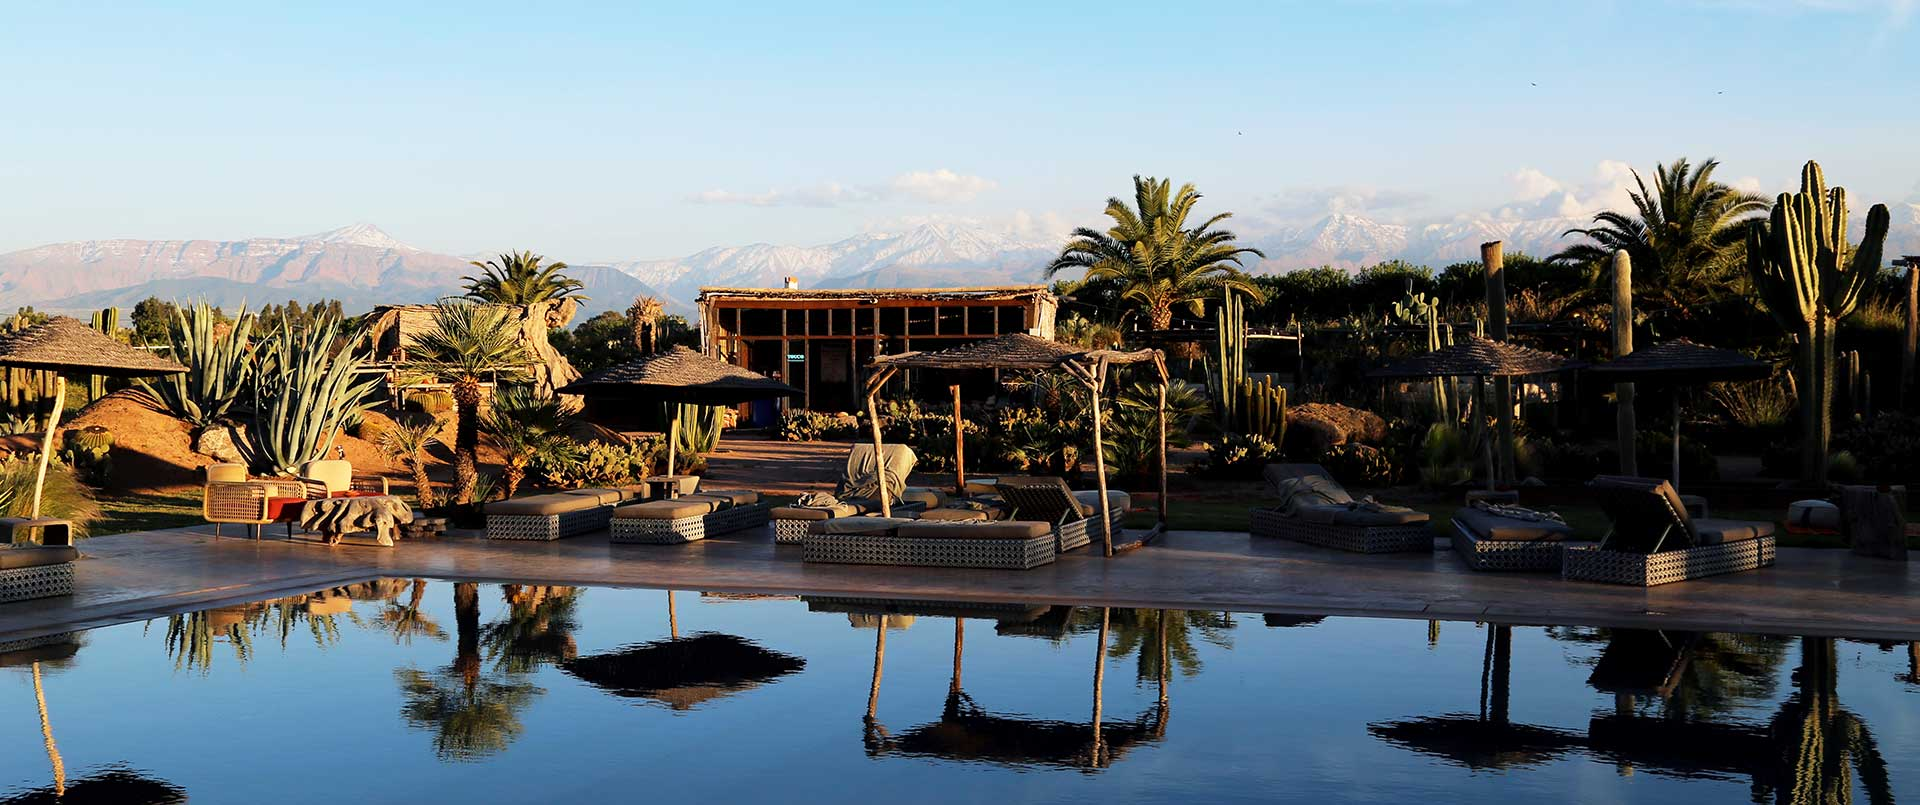 Fellah Hotel, Marrakech